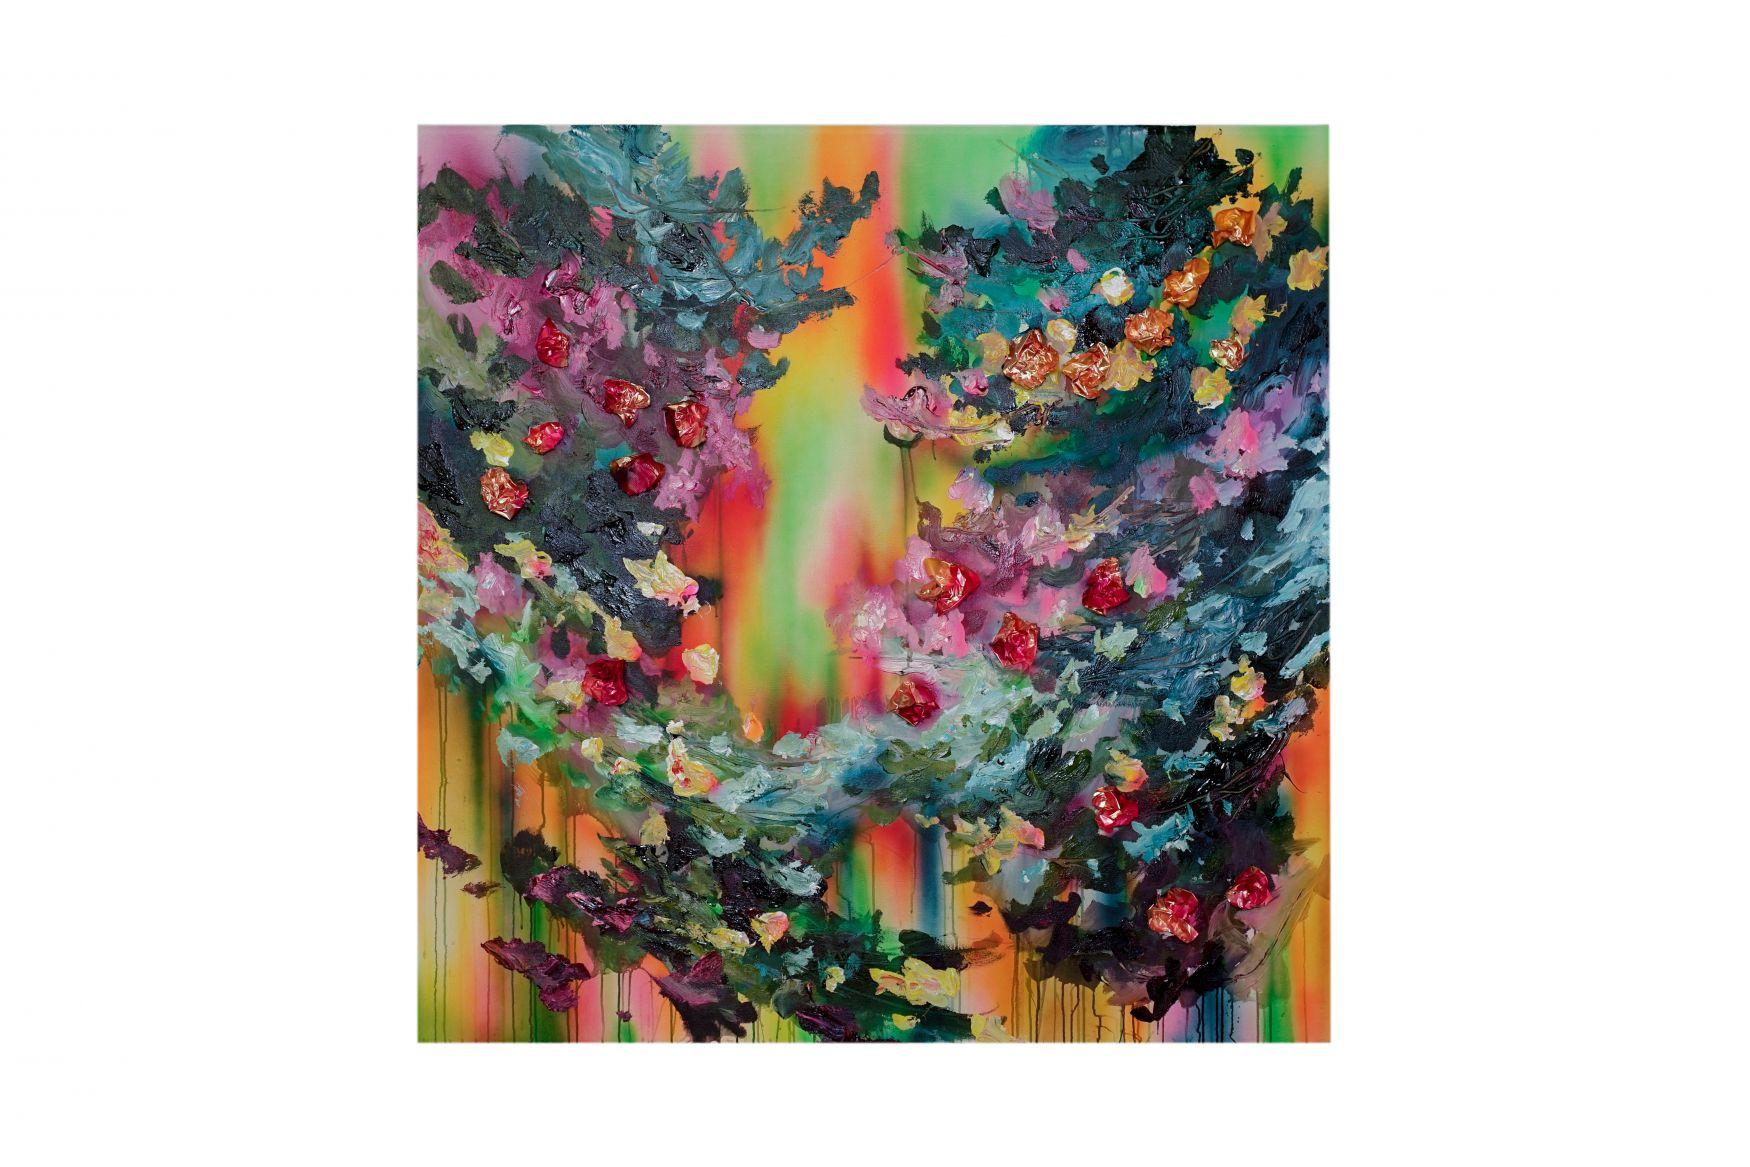 My Secret Rose Garden 0115 (2018) - Arne Quinze